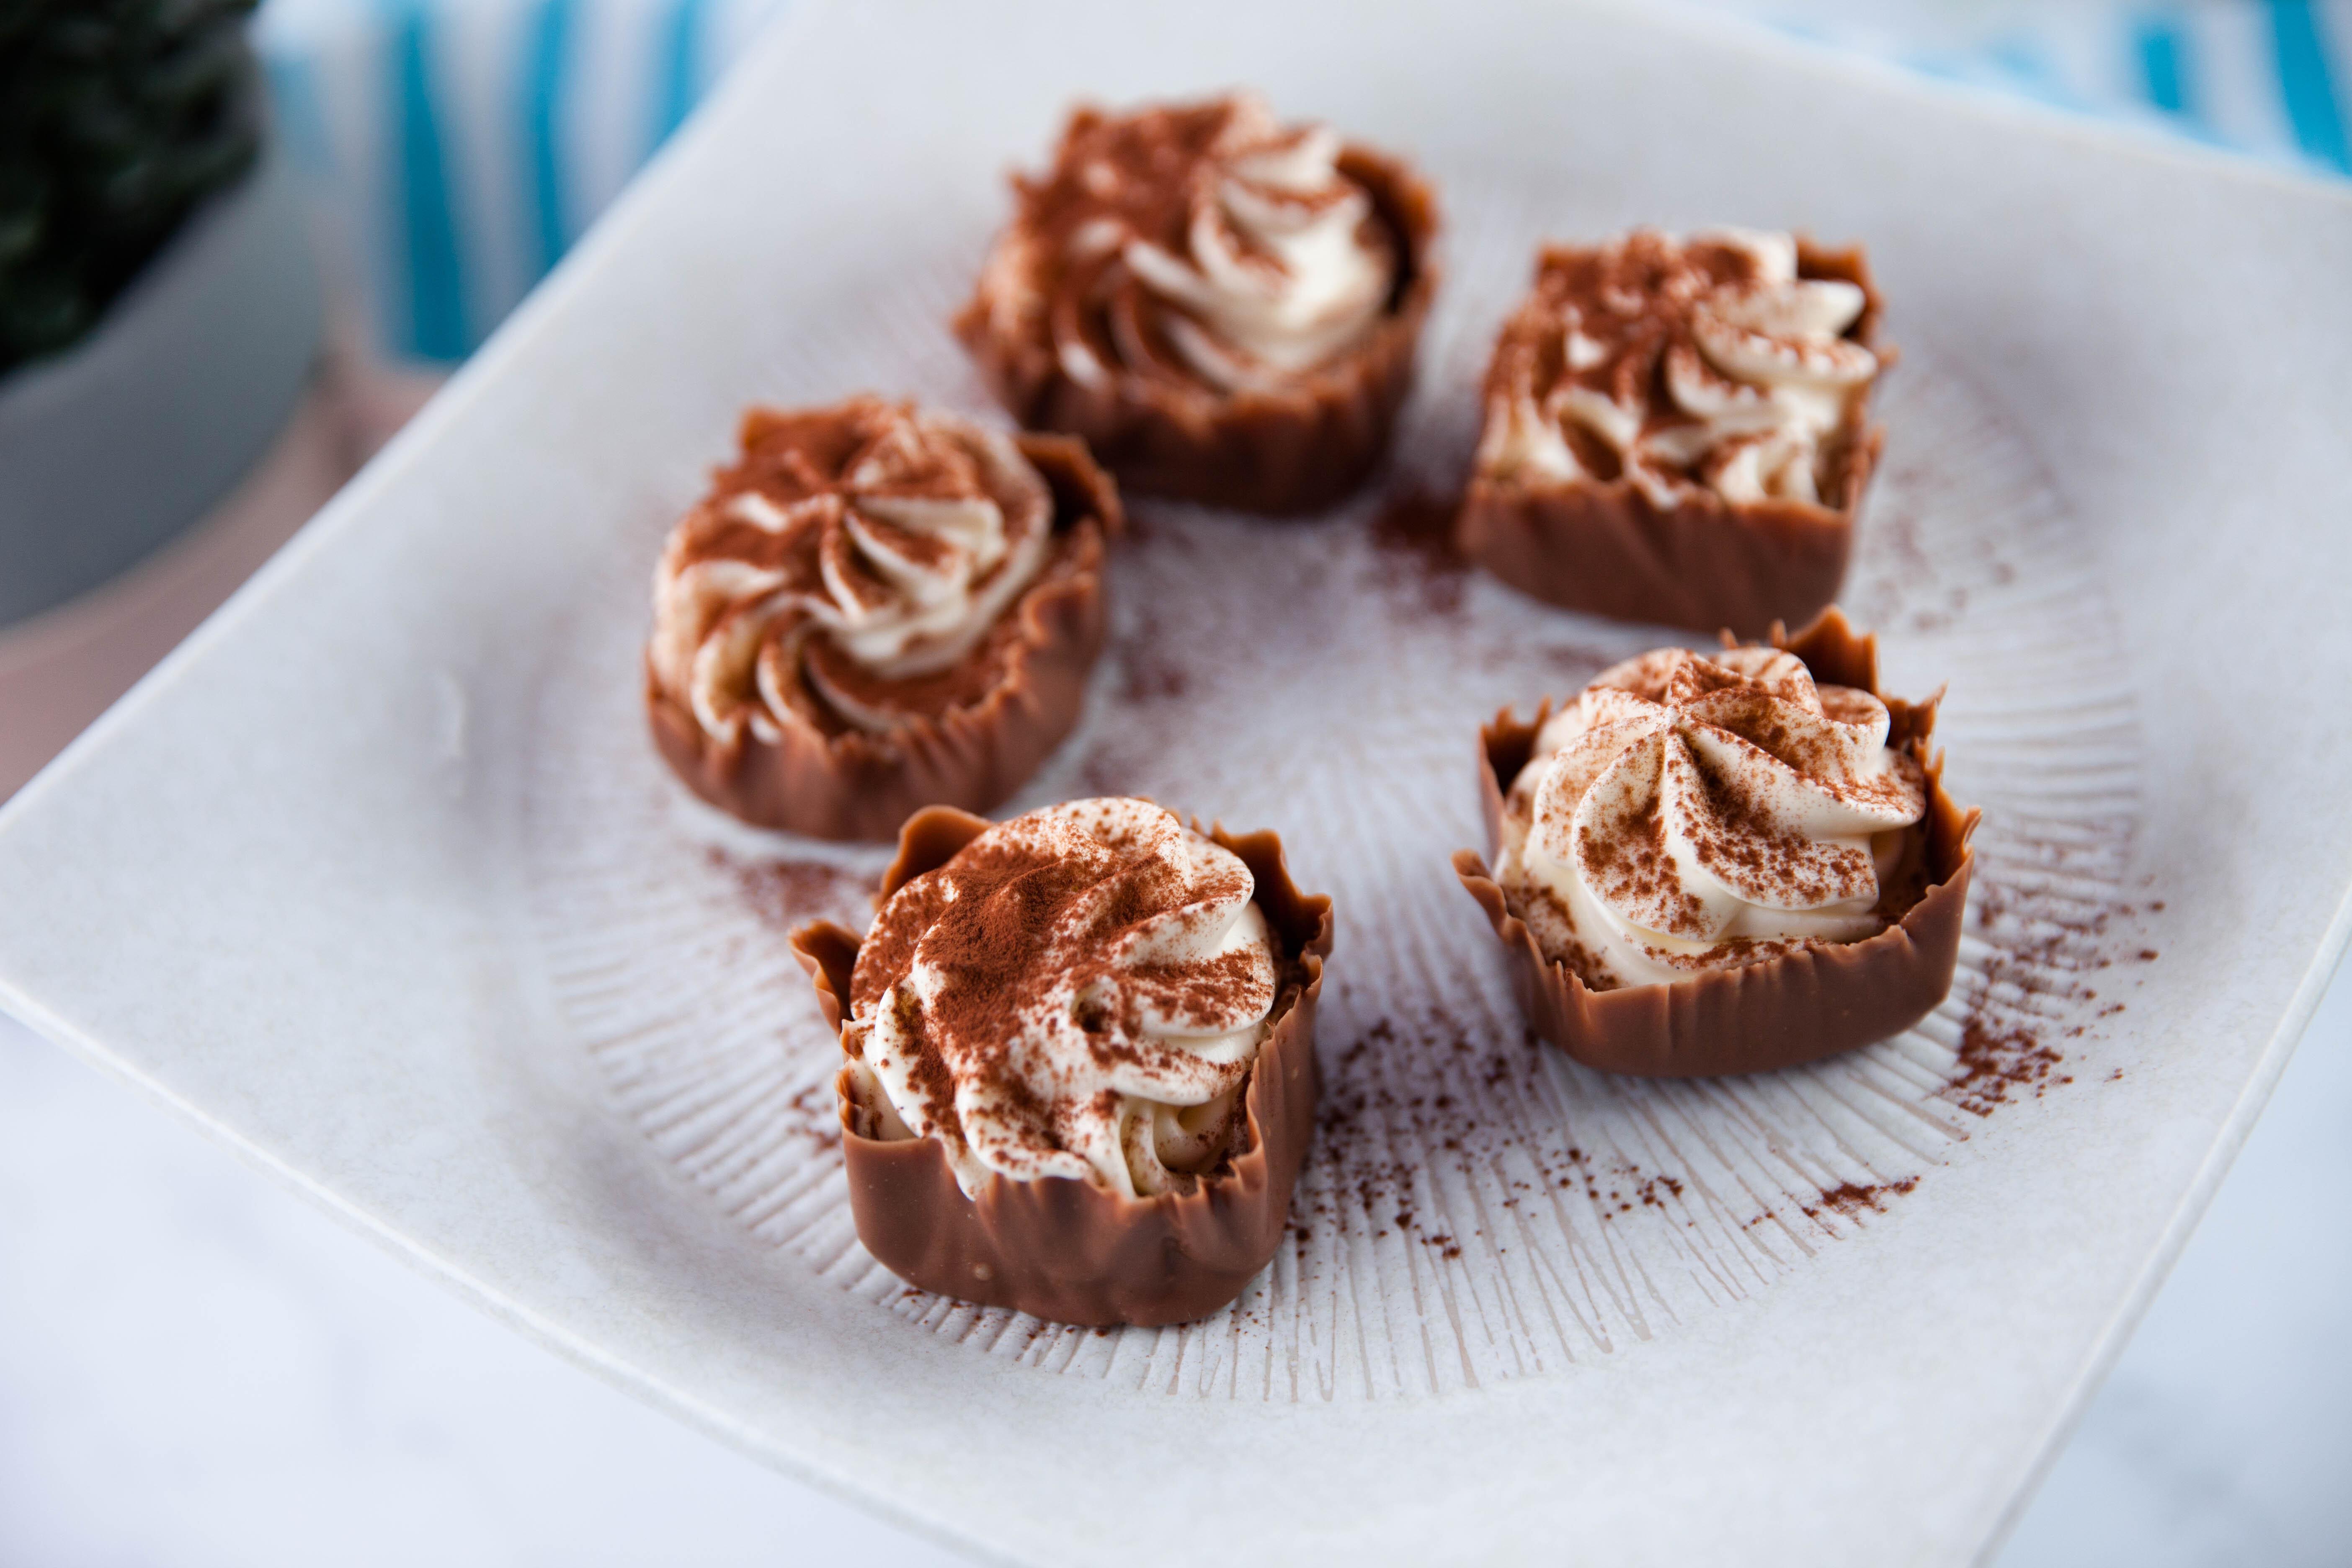 Schokoladenquadrate aus Chantilly-Creme